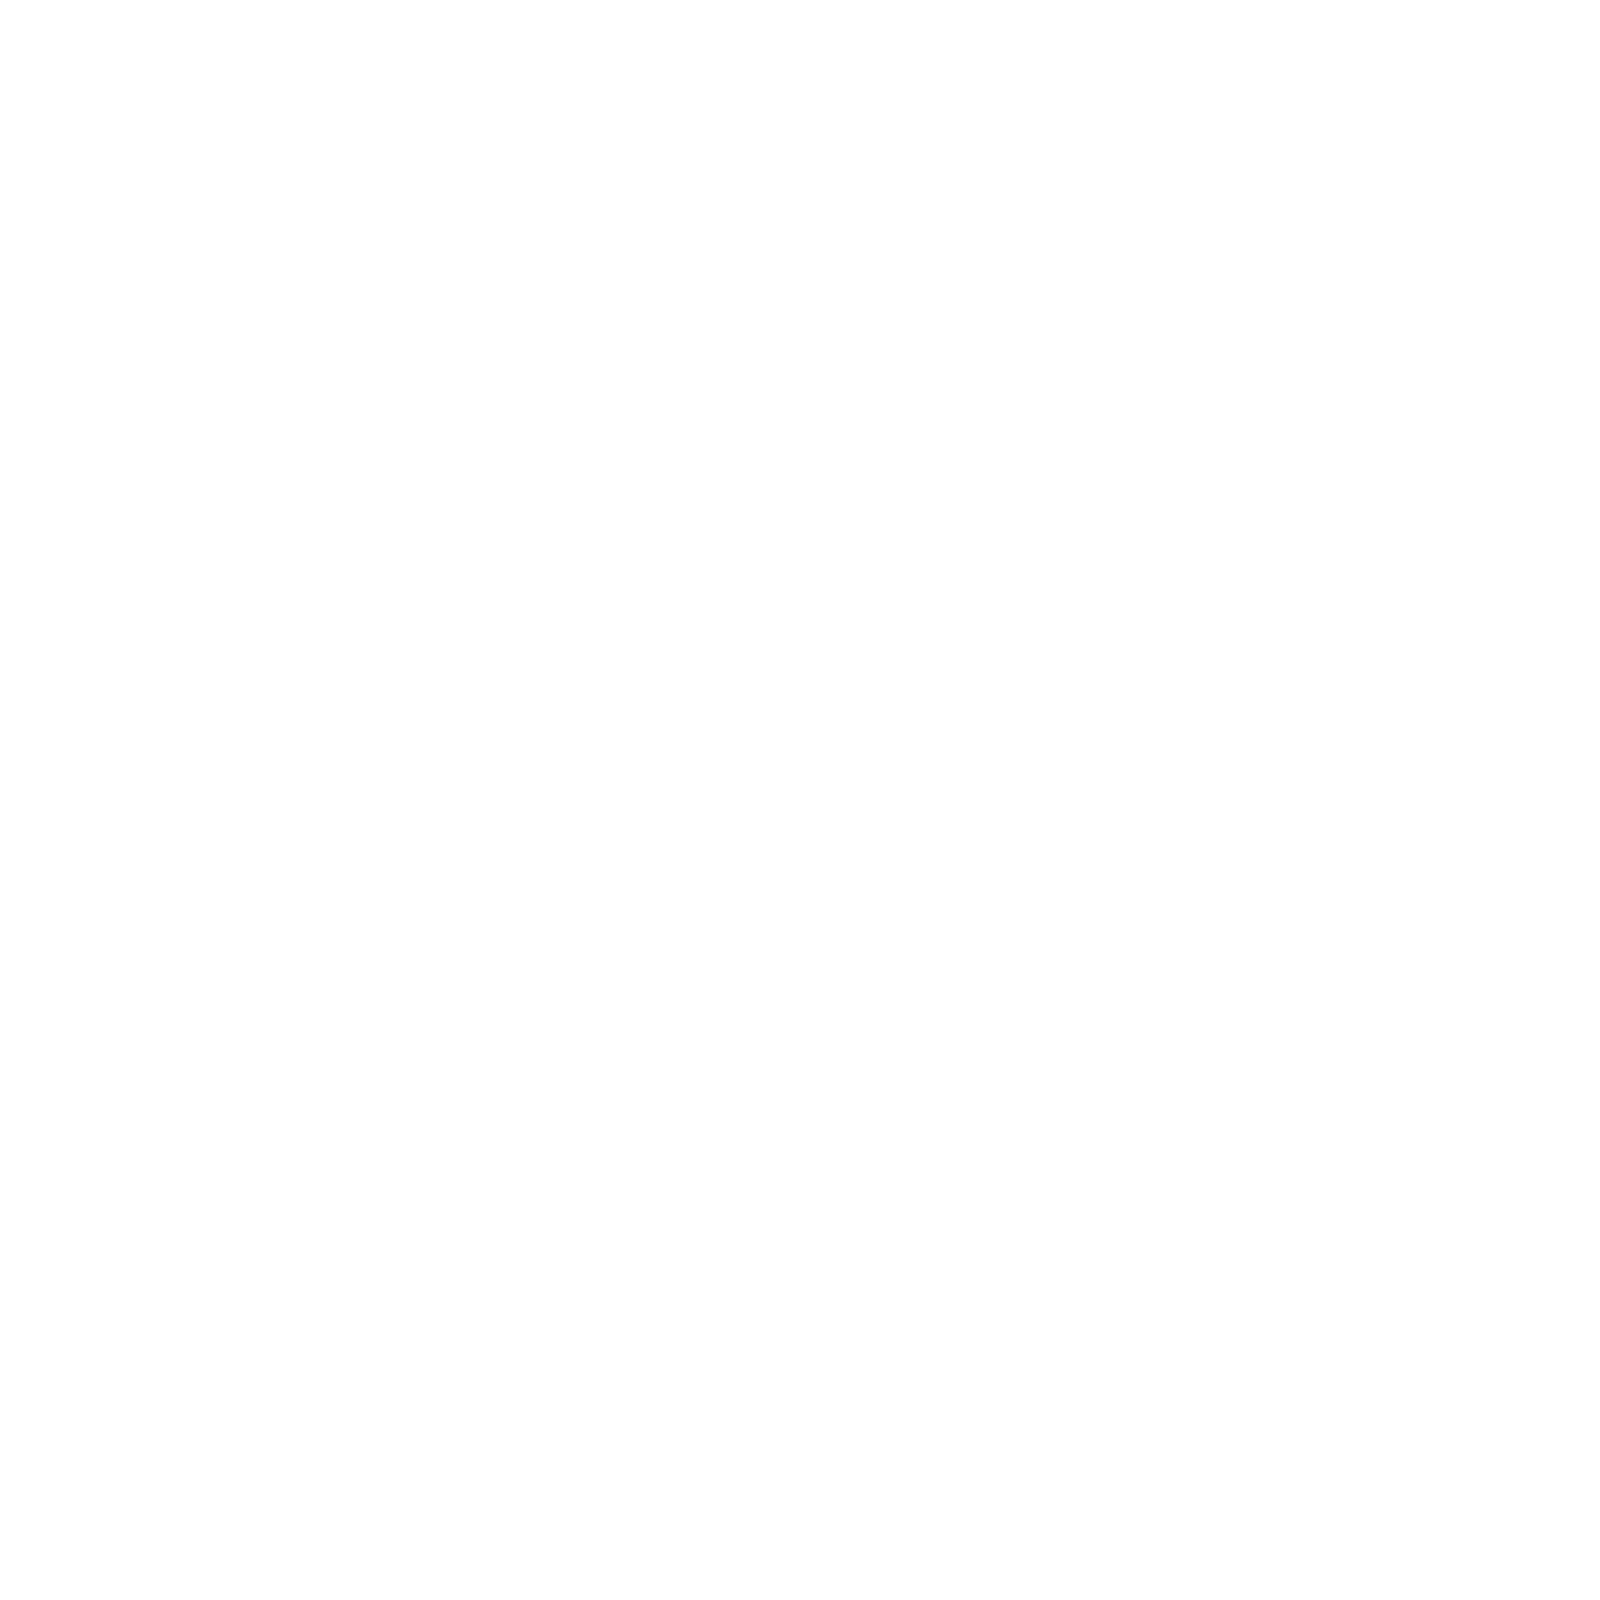 toluna-project-logo